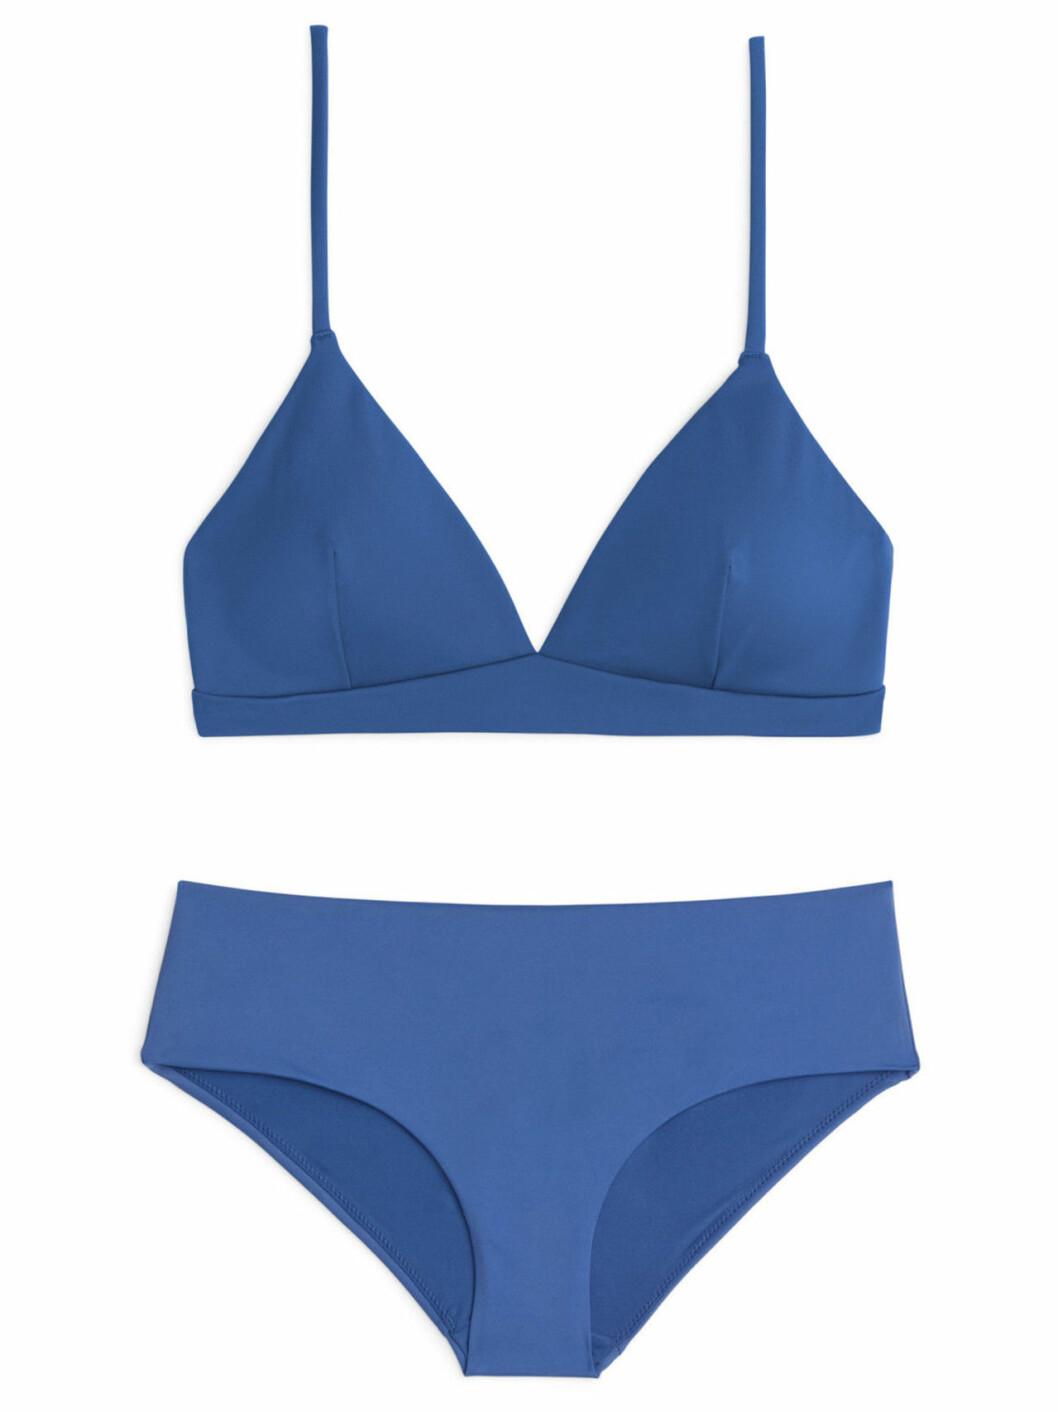 Blå bikini till solresan i vinter